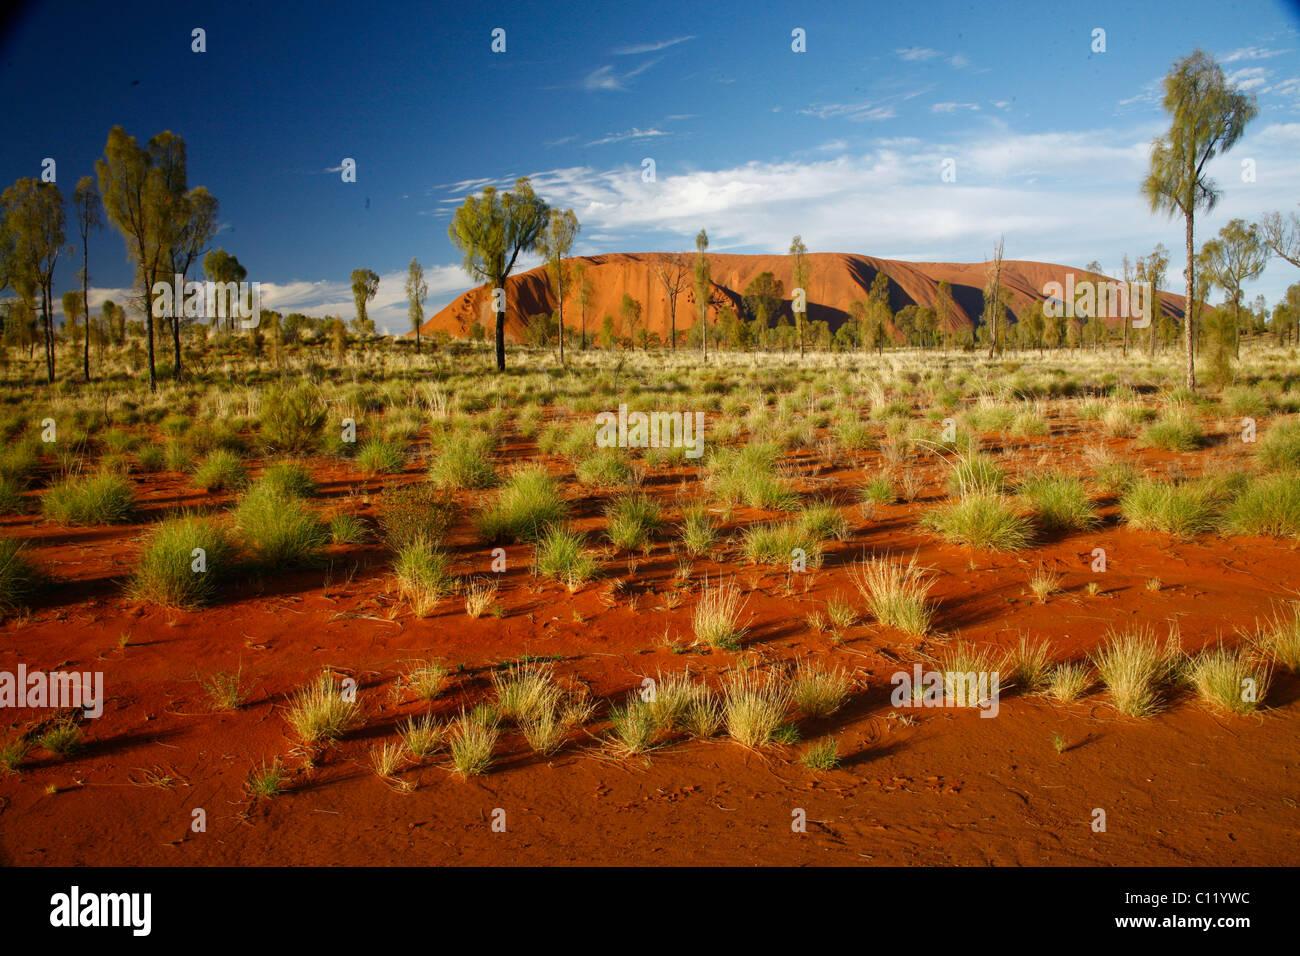 Ayers Rock, Uluru, Northern Territory, Australia - Stock Image